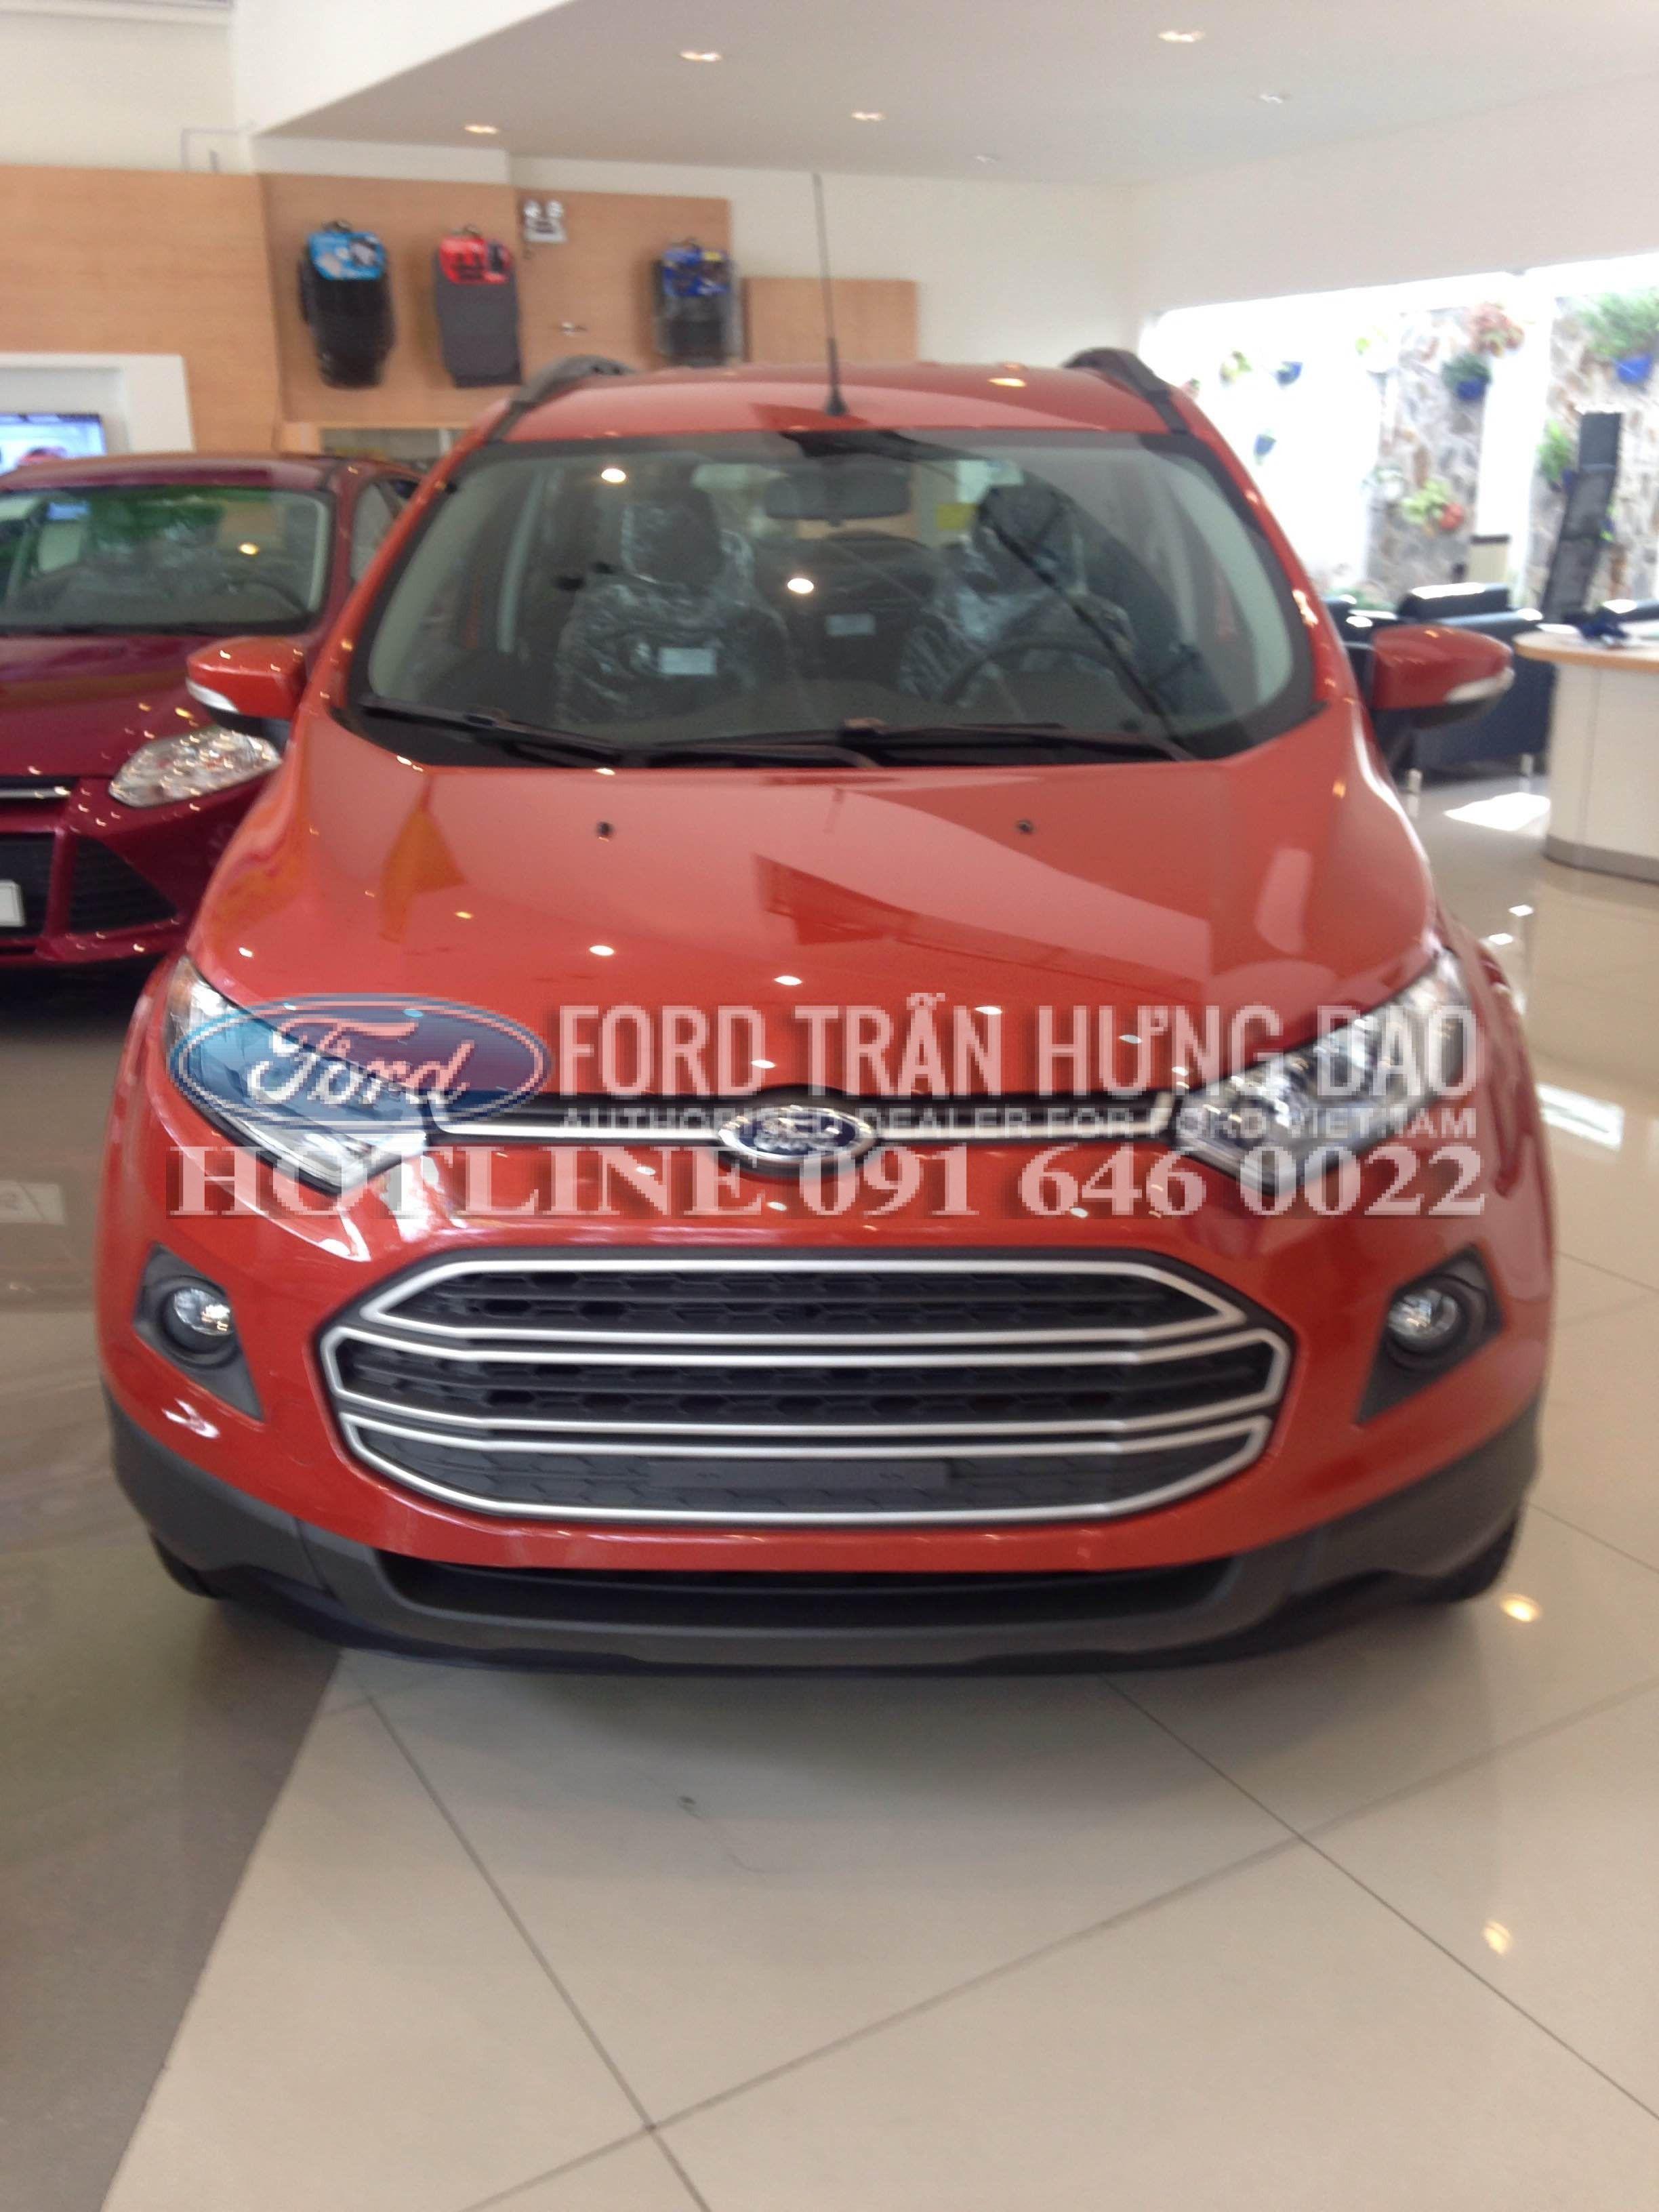 Ford gi ford ecosport